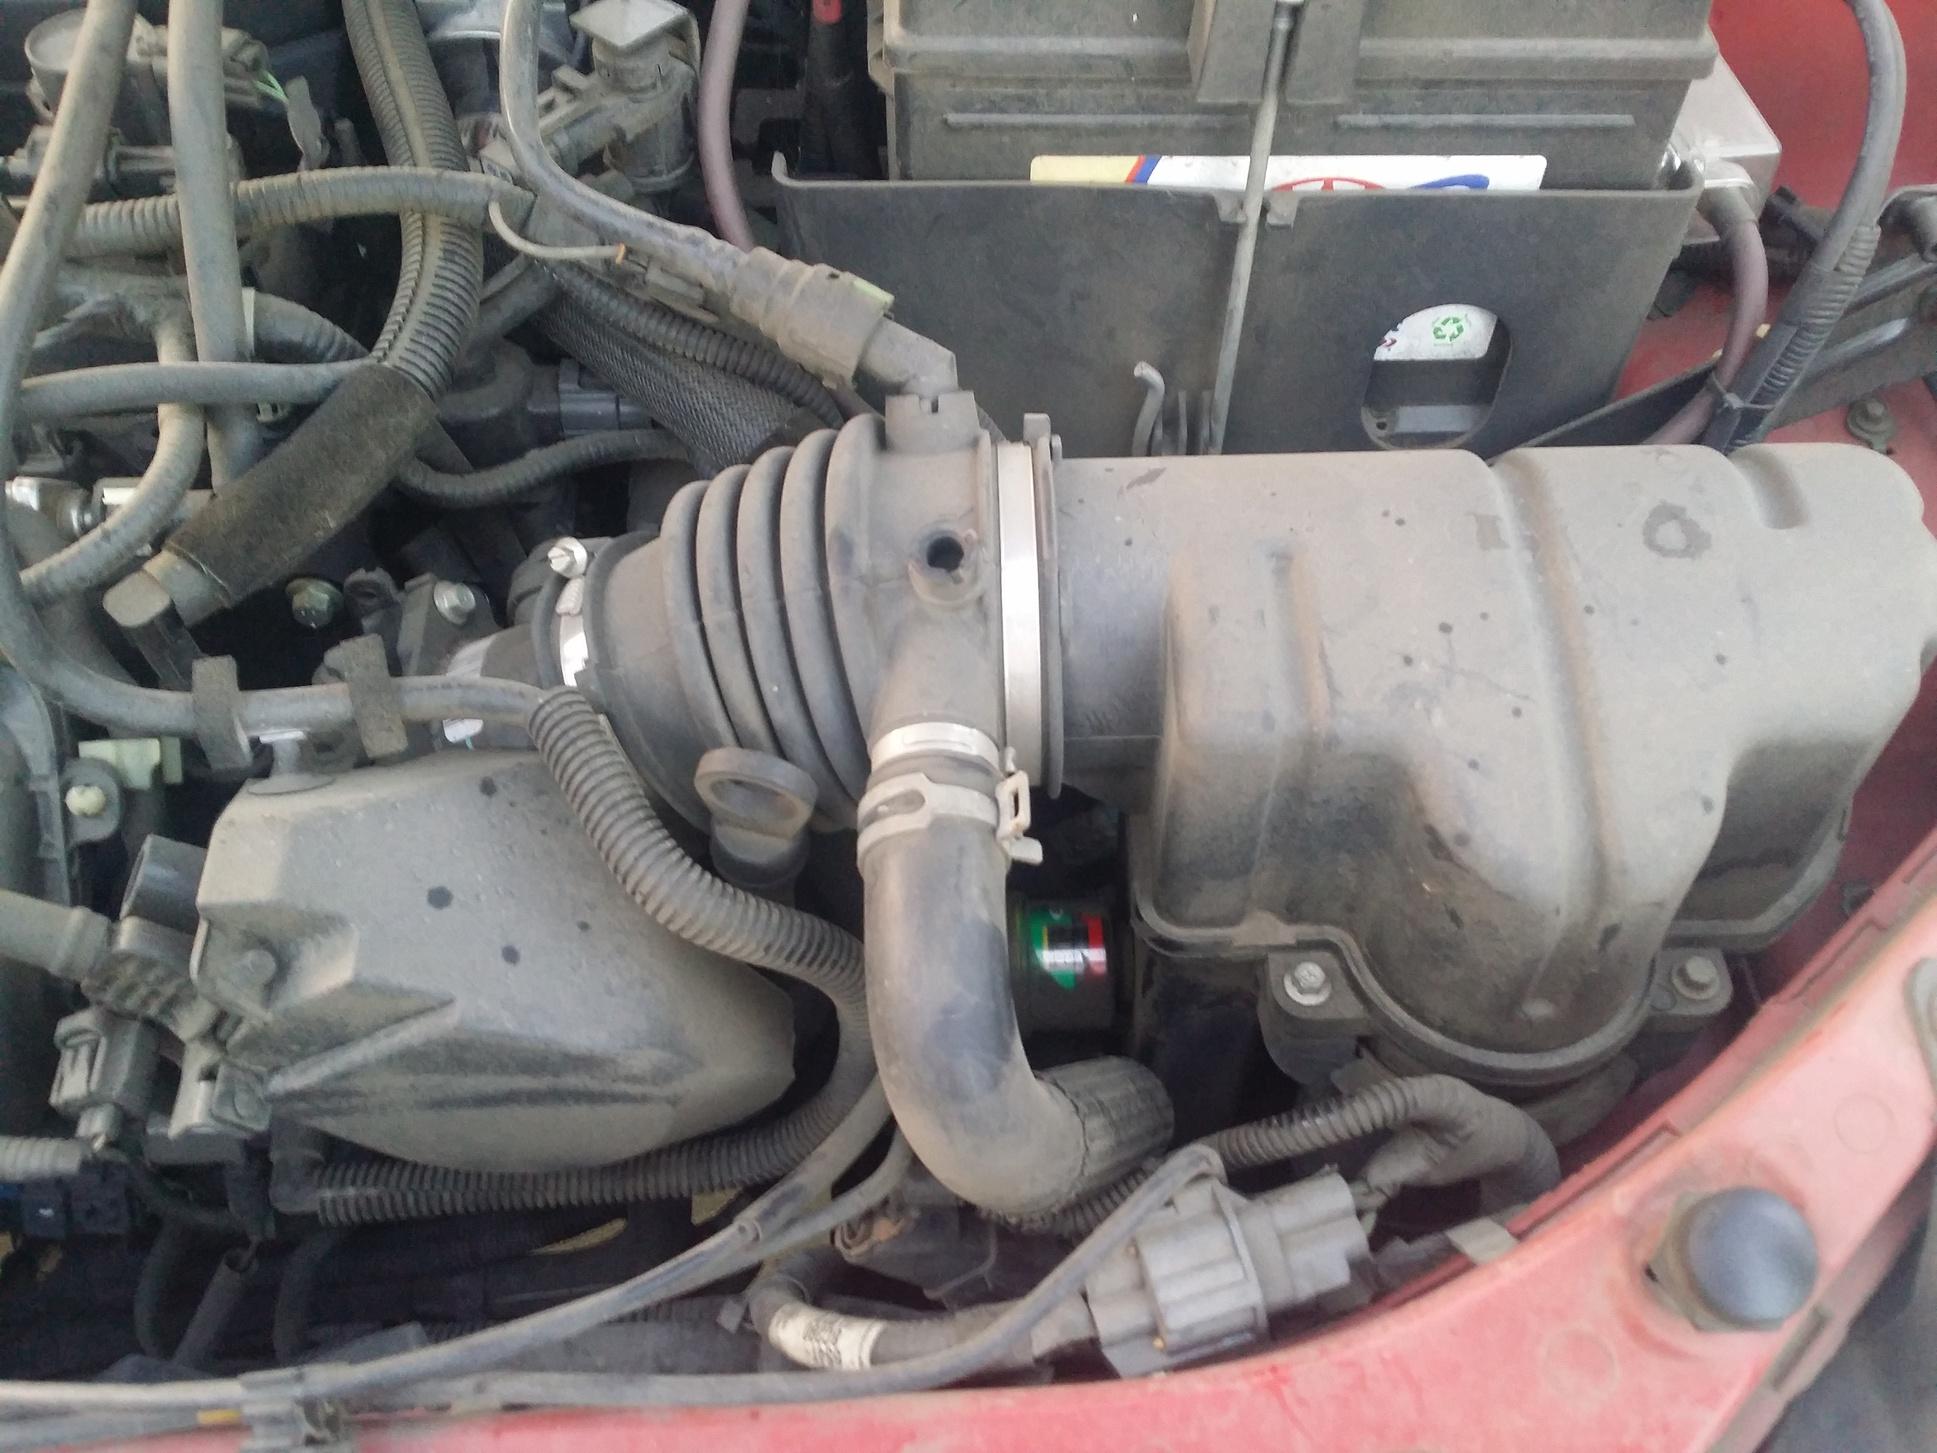 2006 ford focus pzev air intake help 20150603_194315